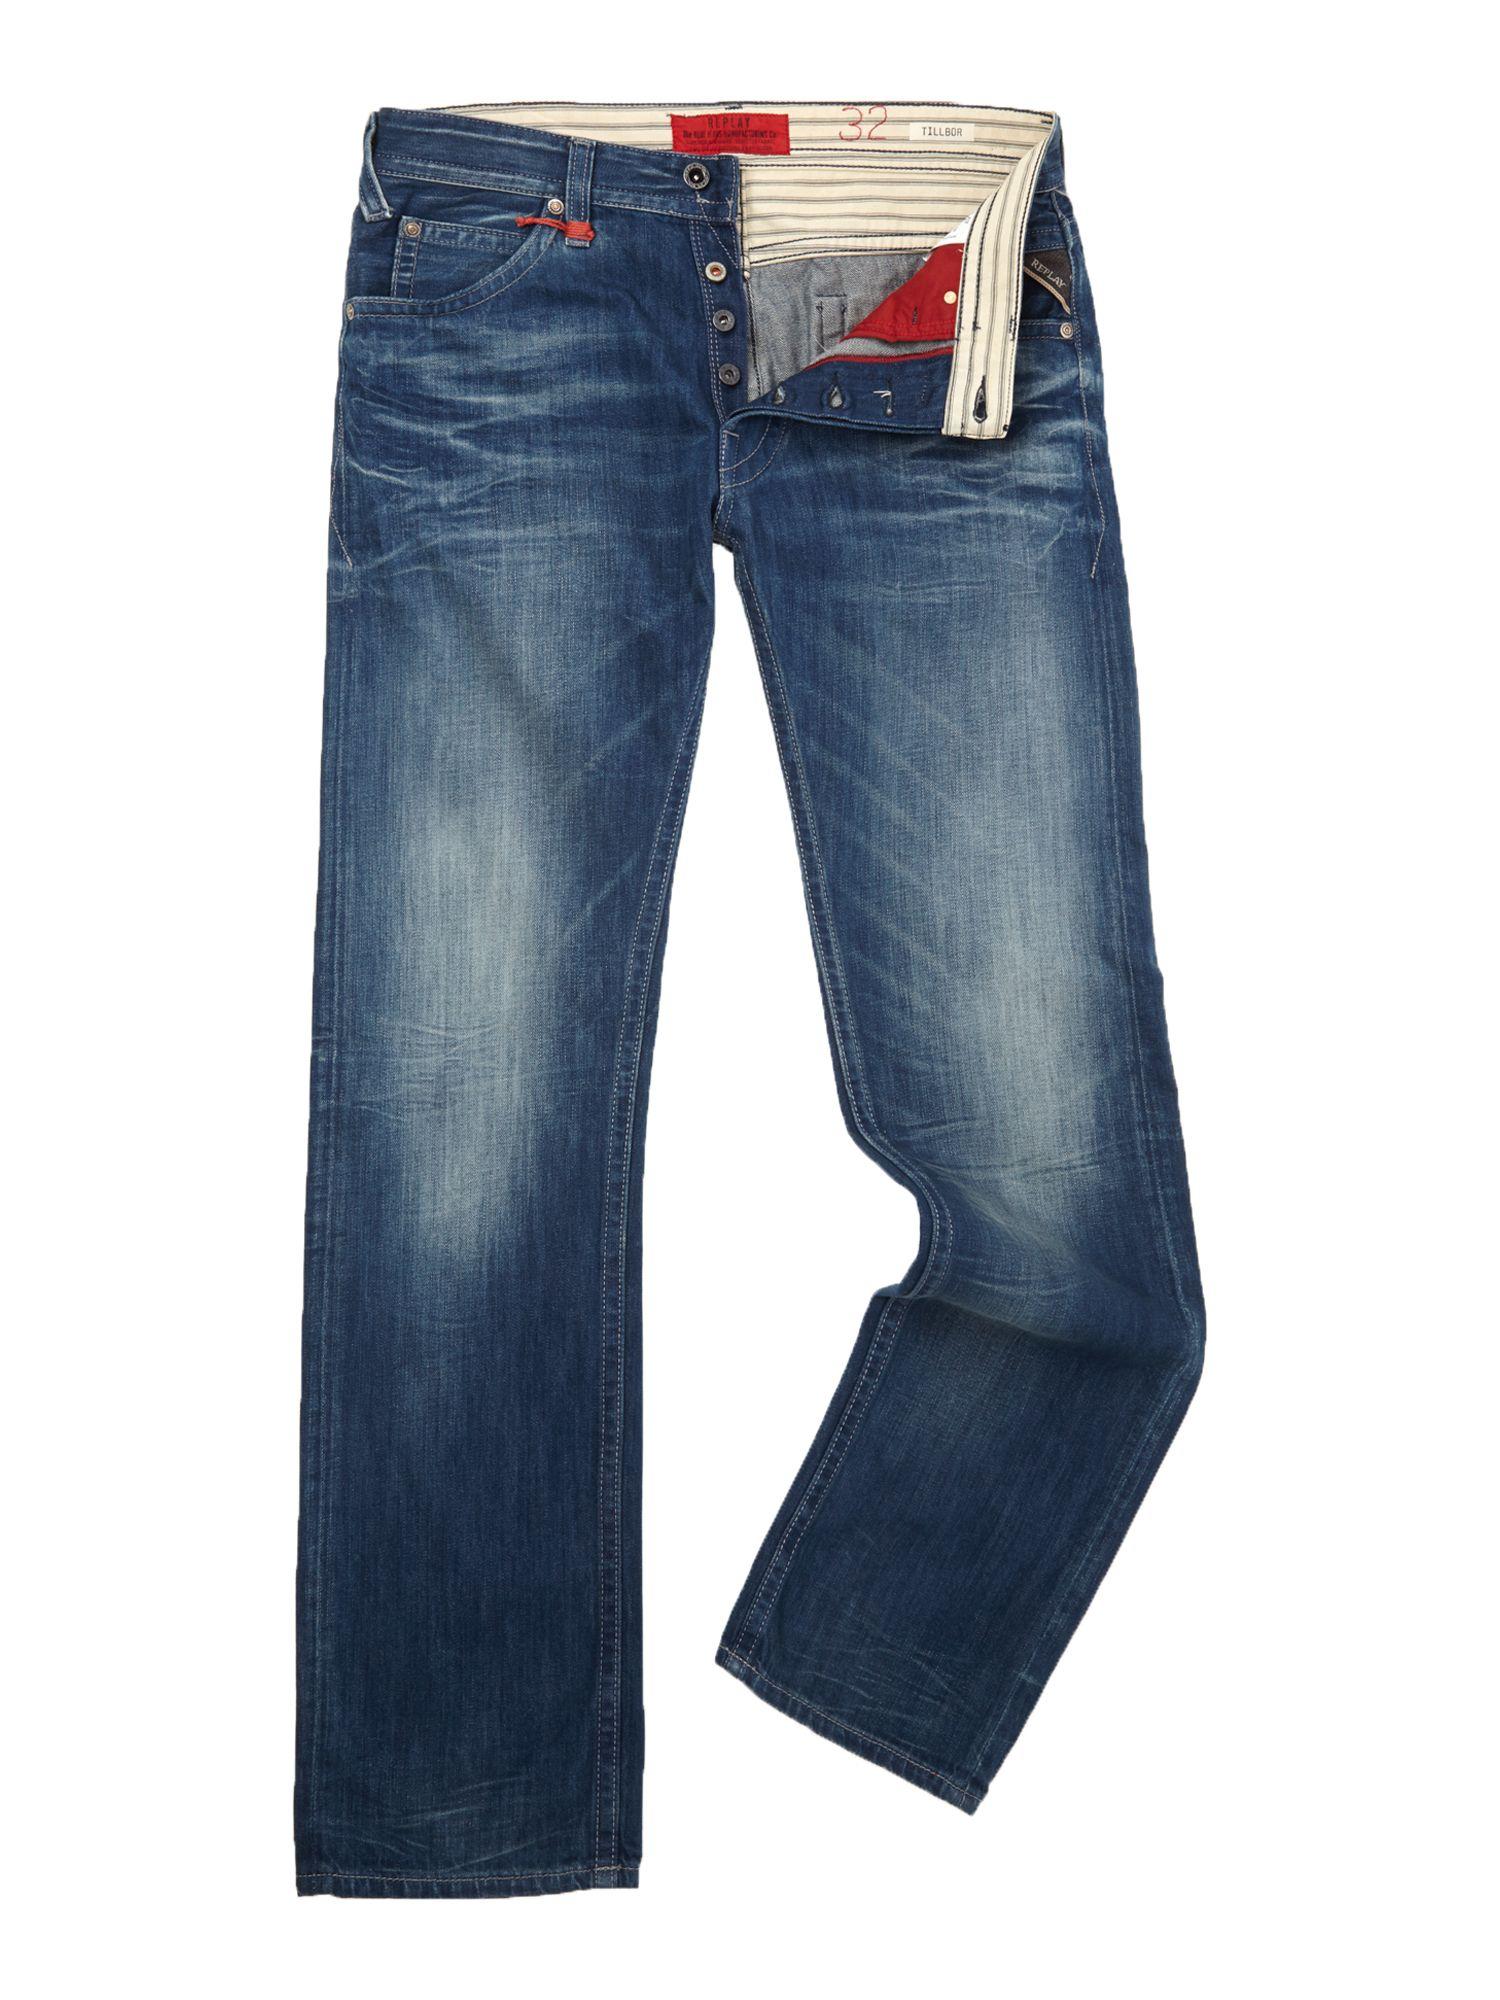 Cheap Wiki Tillbor Slim Mens Jeans Replay Pre Order Cheap Online zRtSAih6